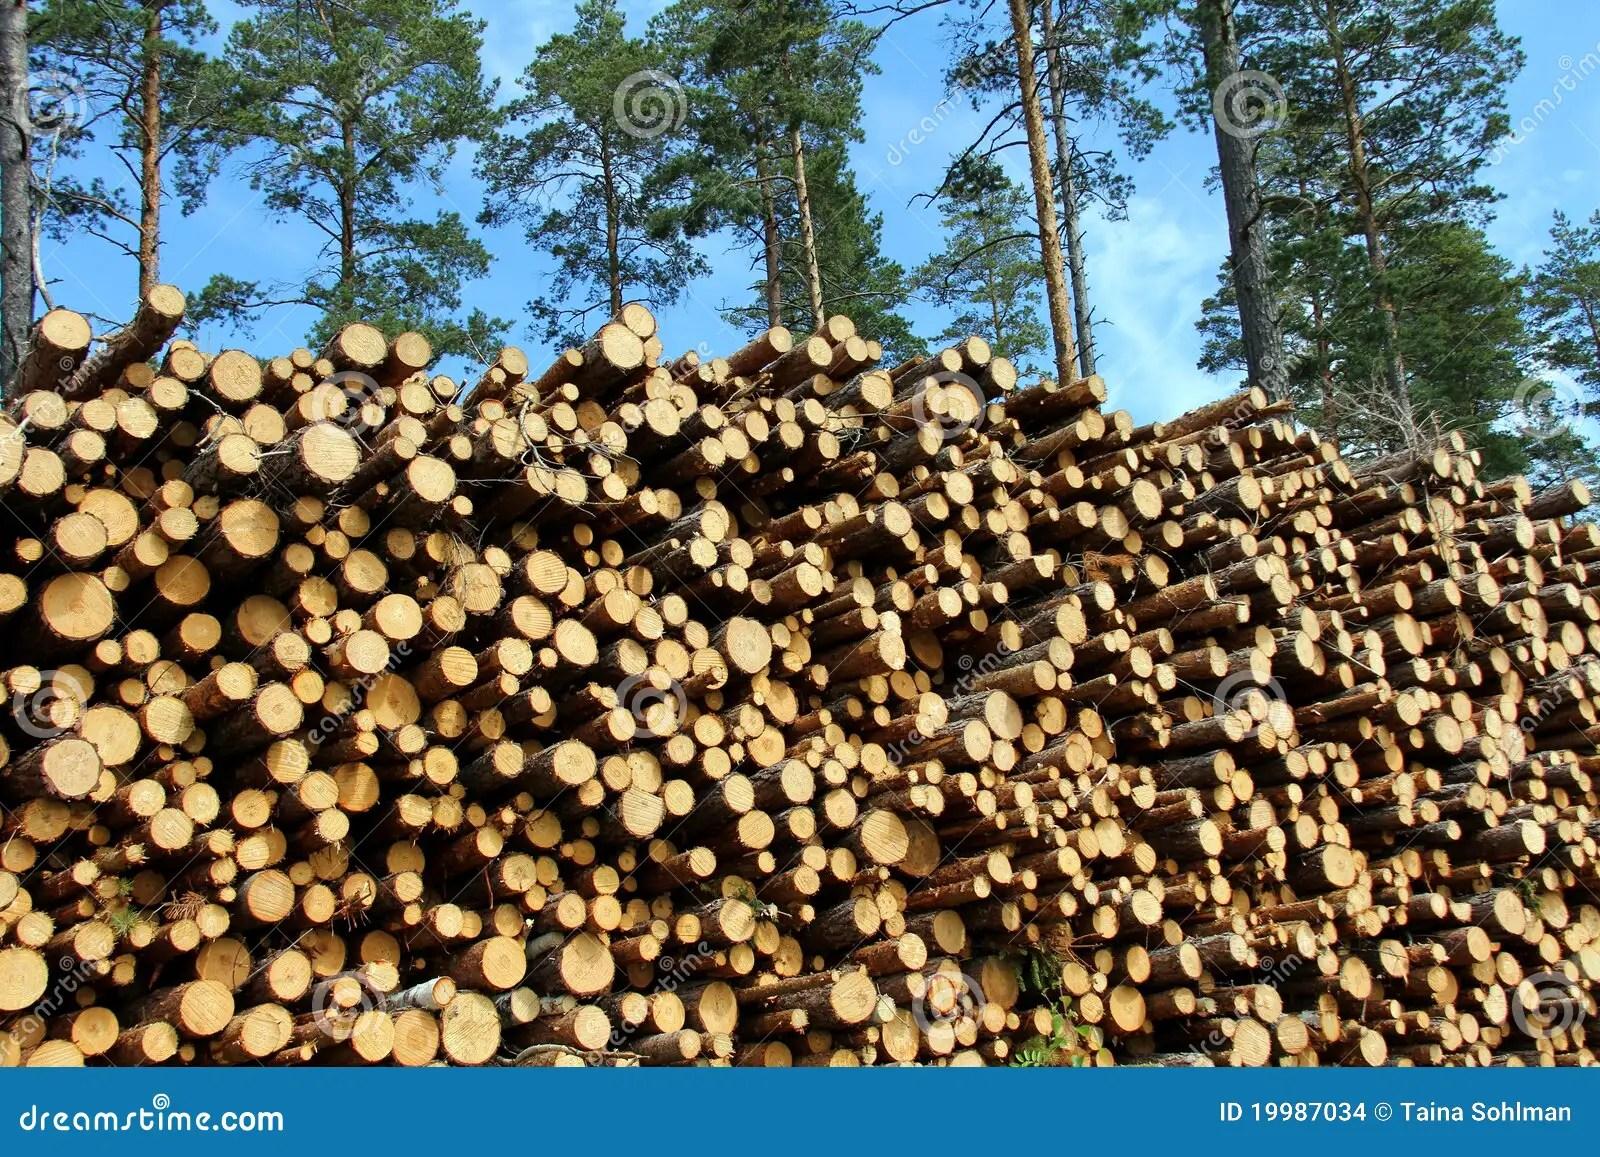 Renewable Resources Renewable Resources Wood